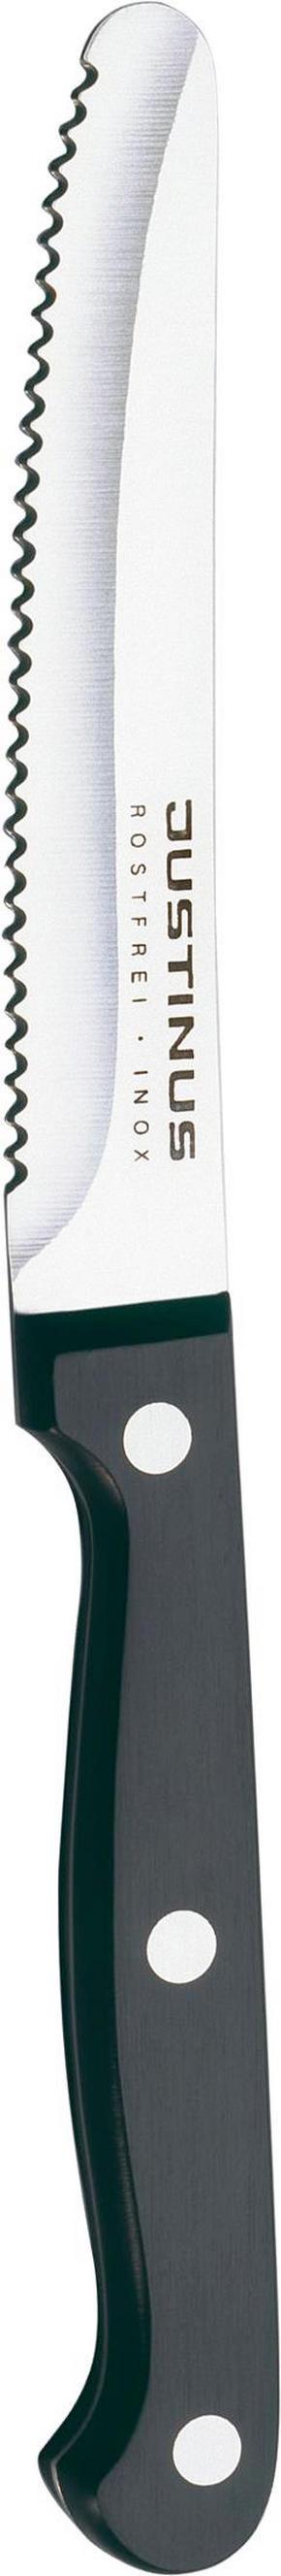 BRÖDKNIV - svart, Basics, metall/plast (22/5/3cm) - Justinus